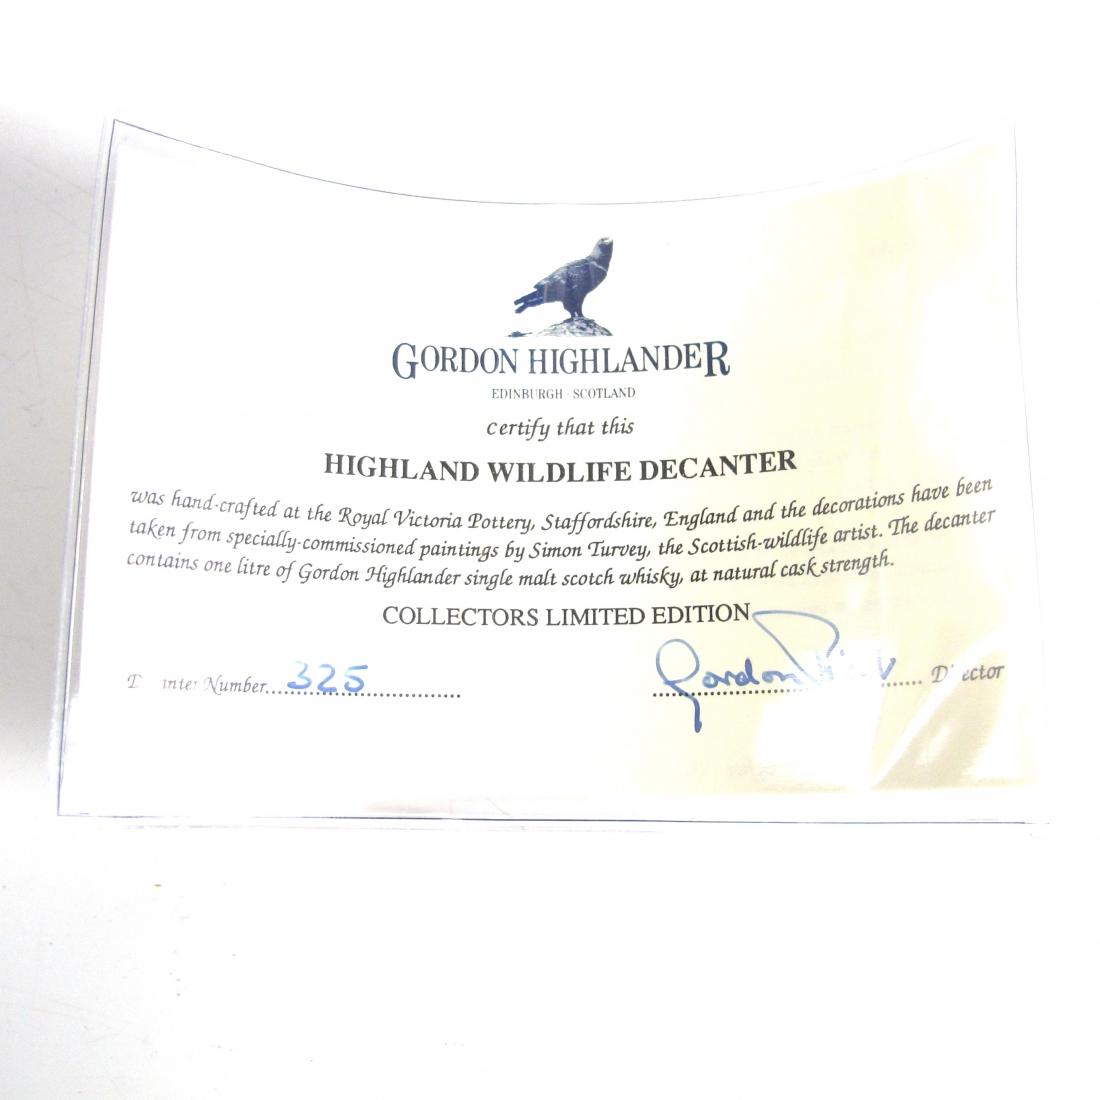 Gordon Highlander 12 Year Old Wildlife Decanter 100 Proof 33.3 Fl. Ozs.